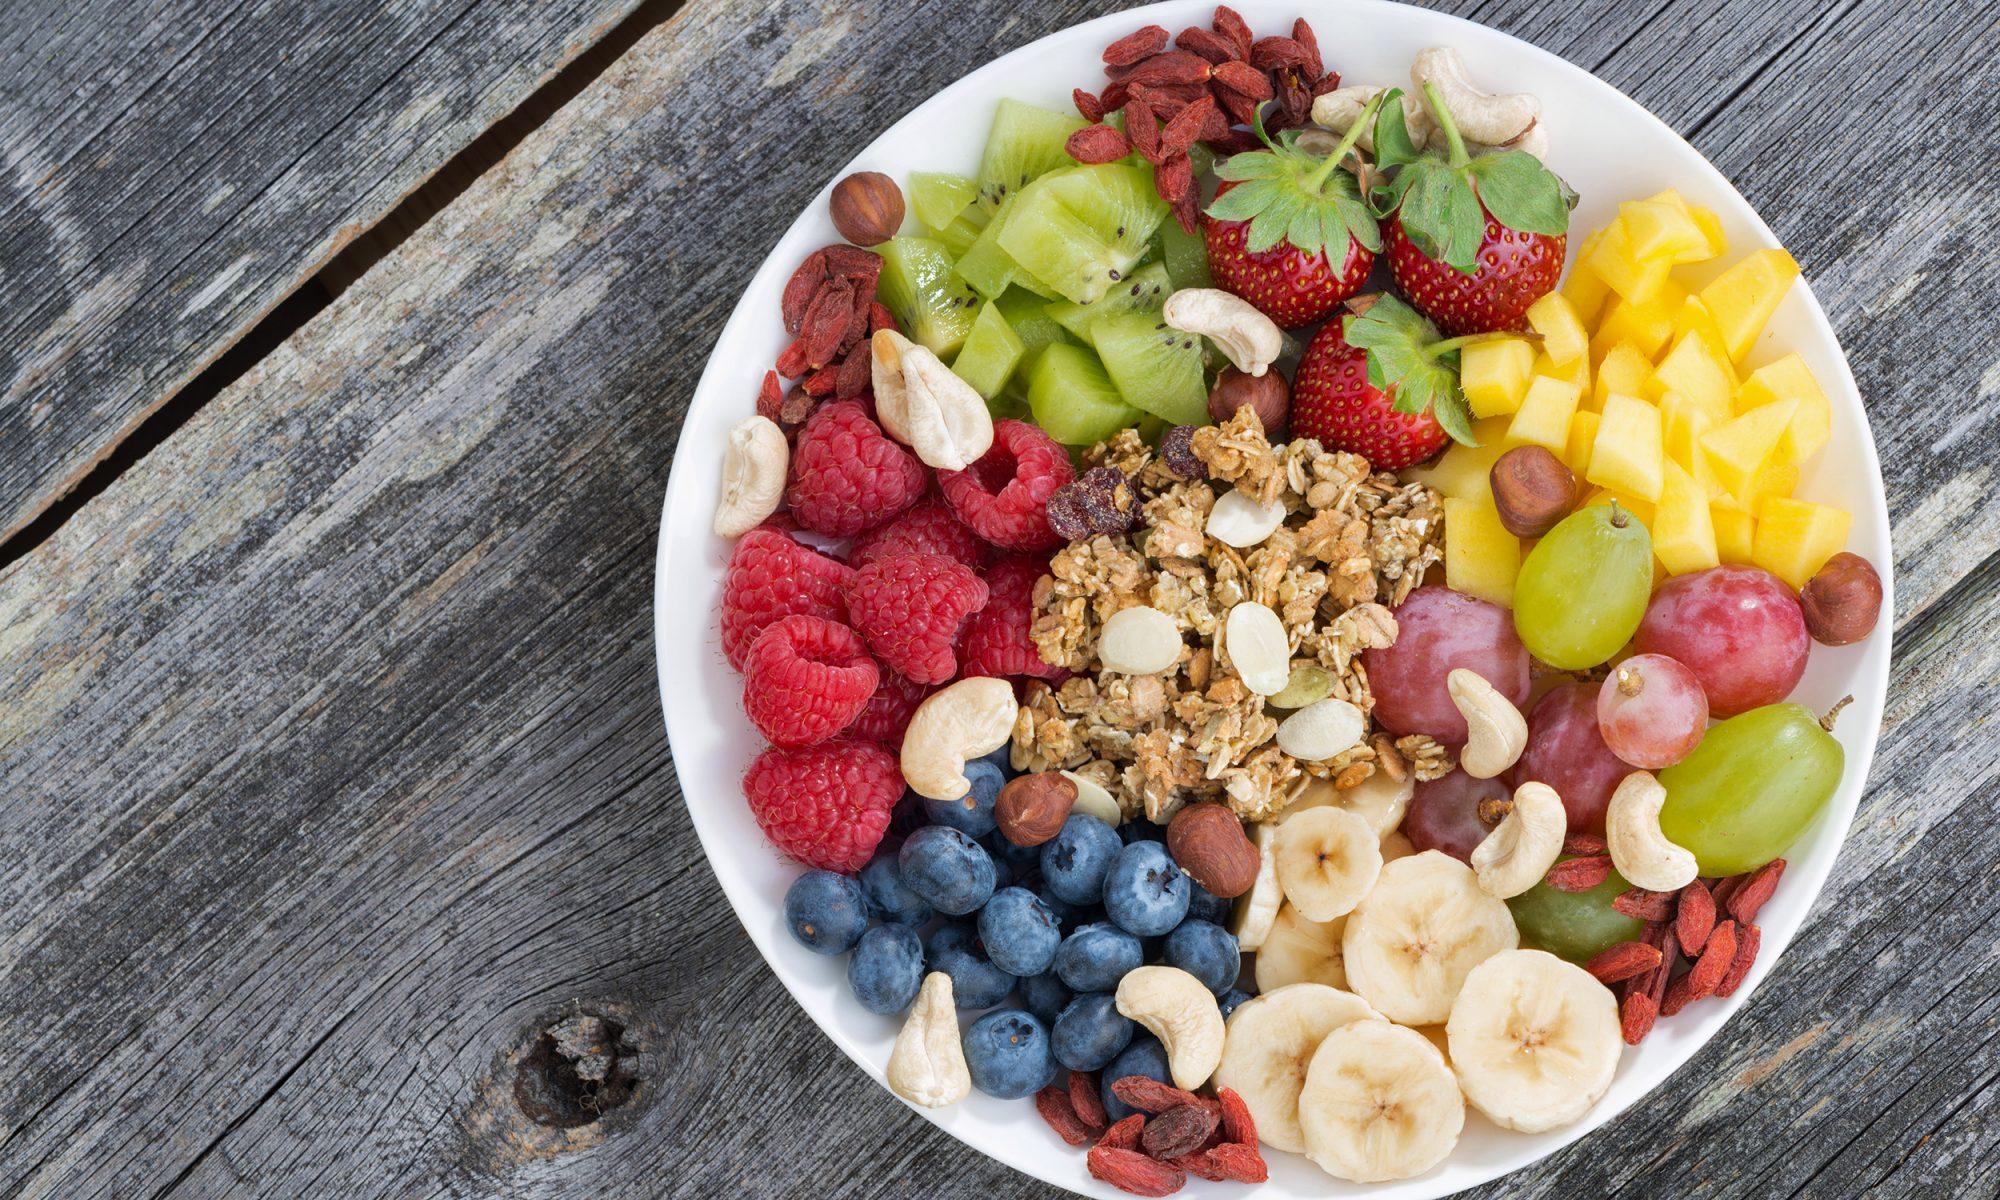 EC: 3 Breakfast Foods You Should Eat for Better Digestion